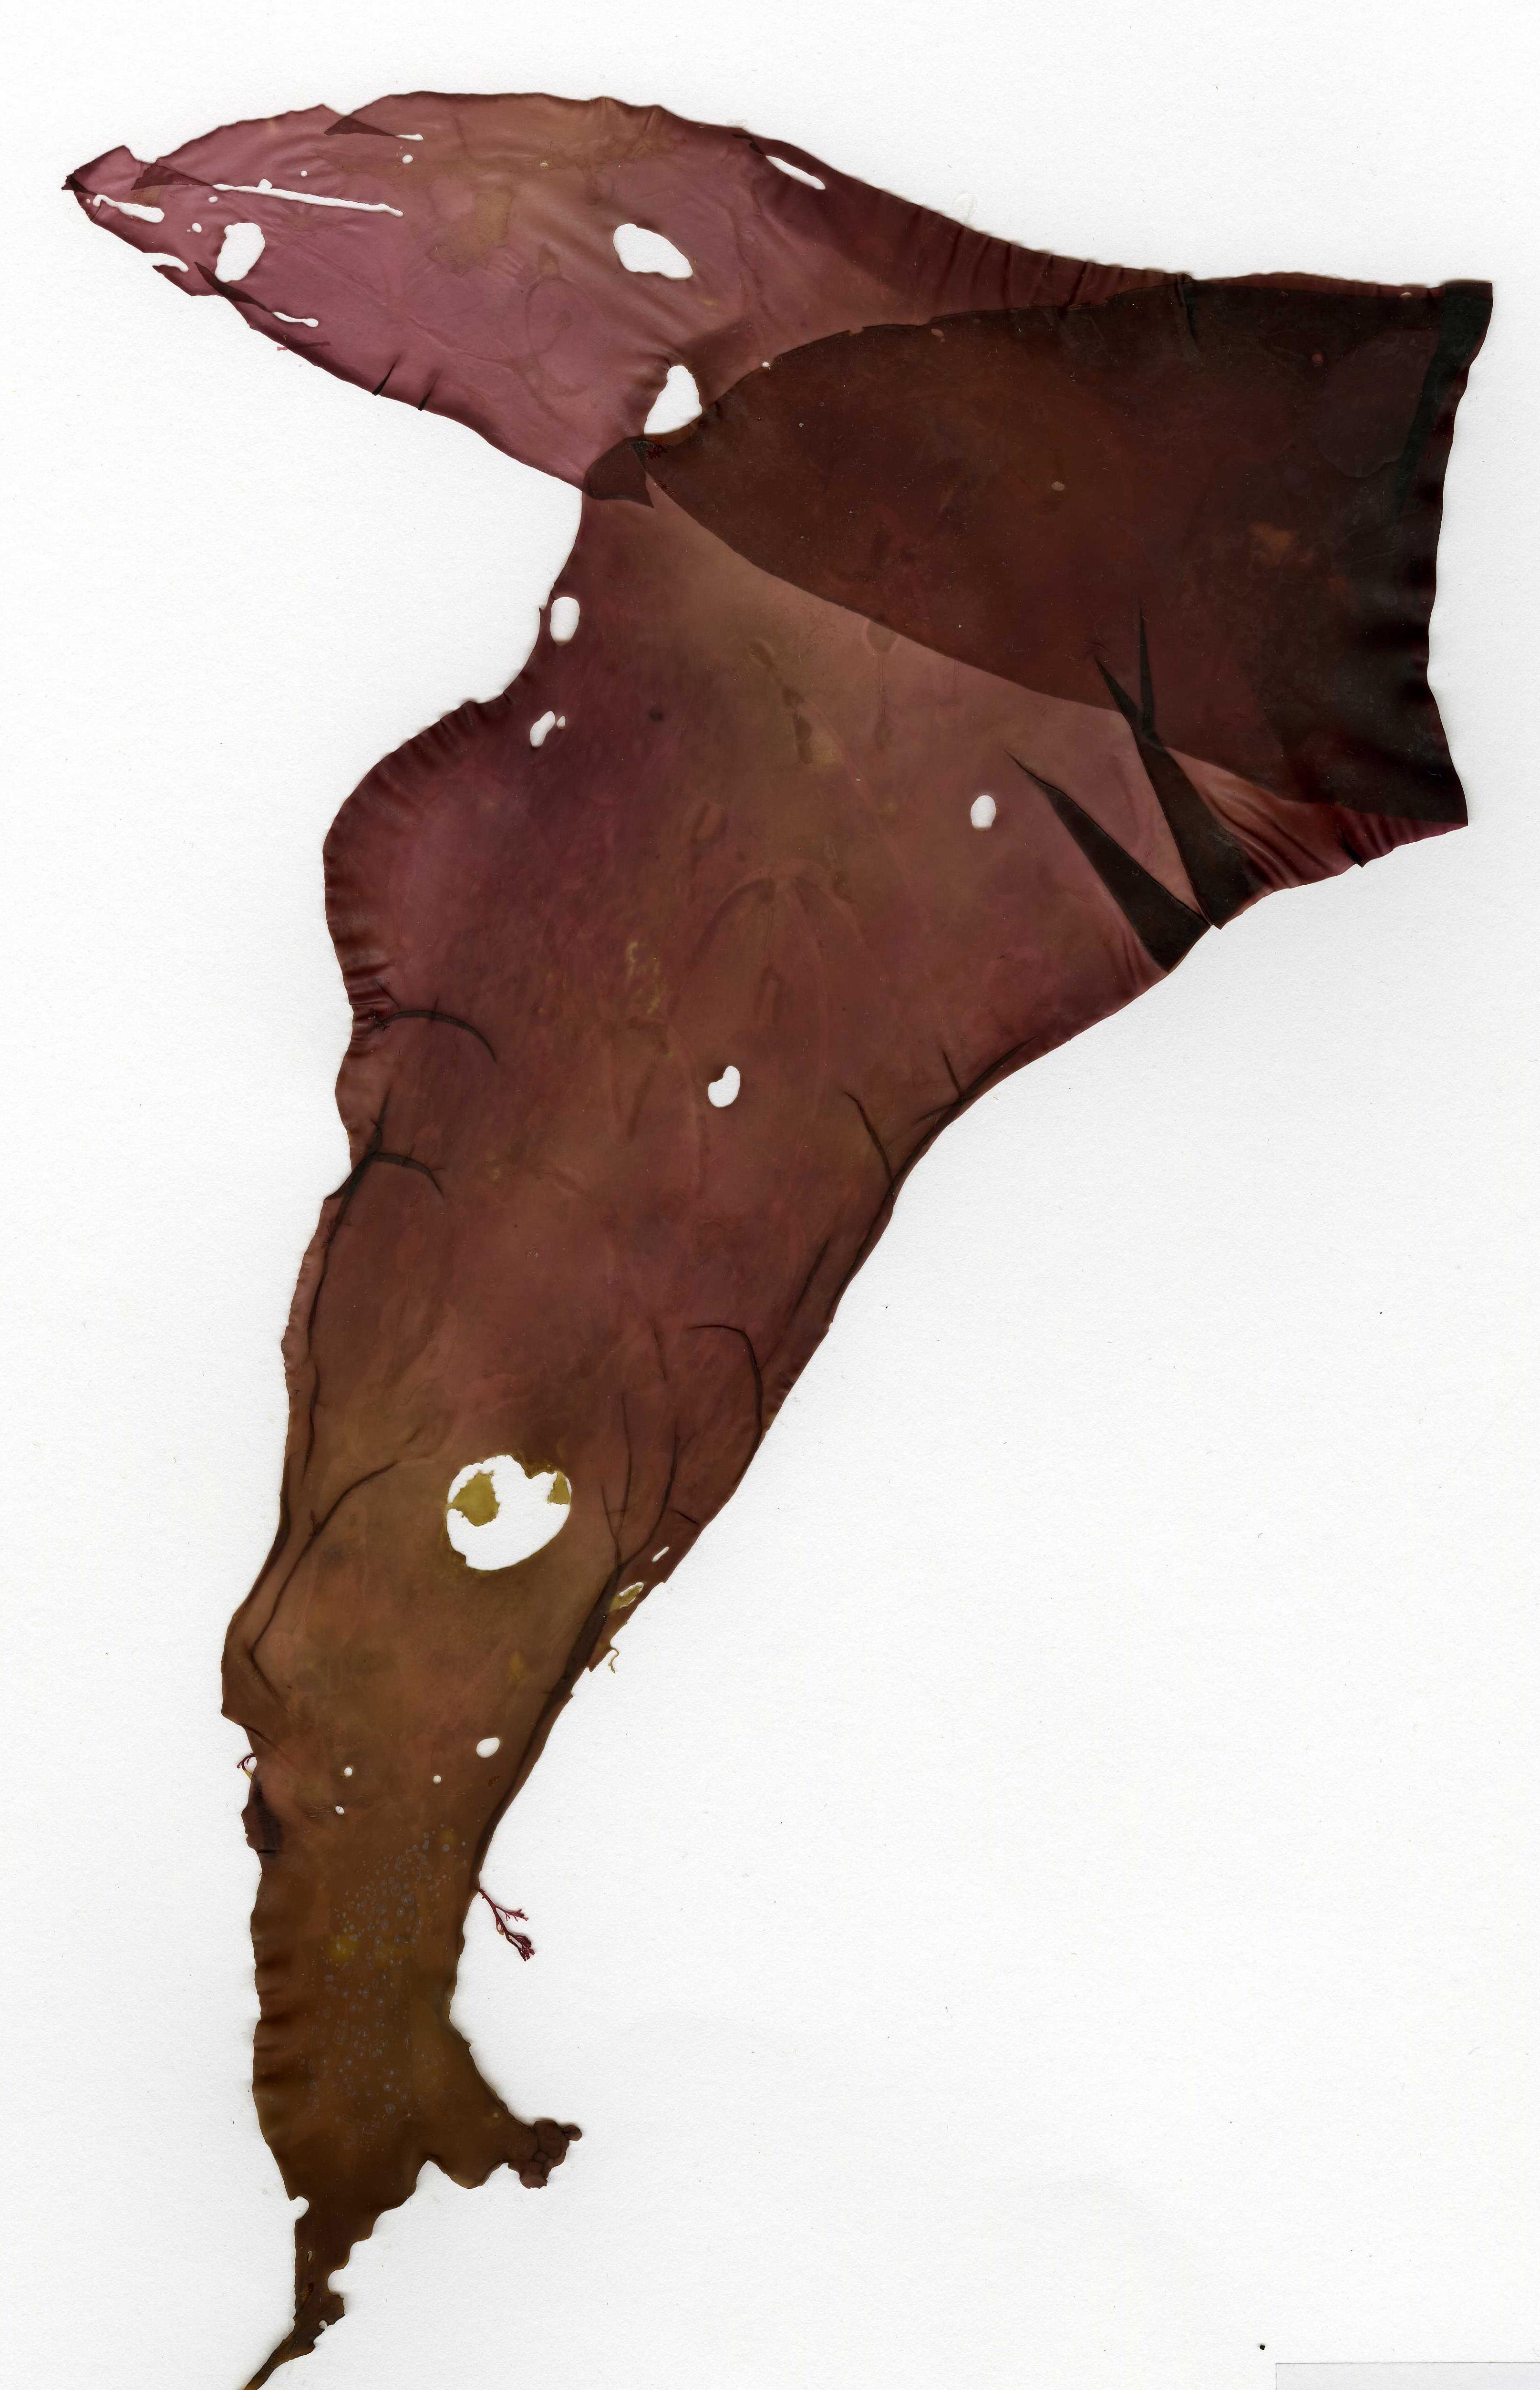 Image of Iridescent Seaweed